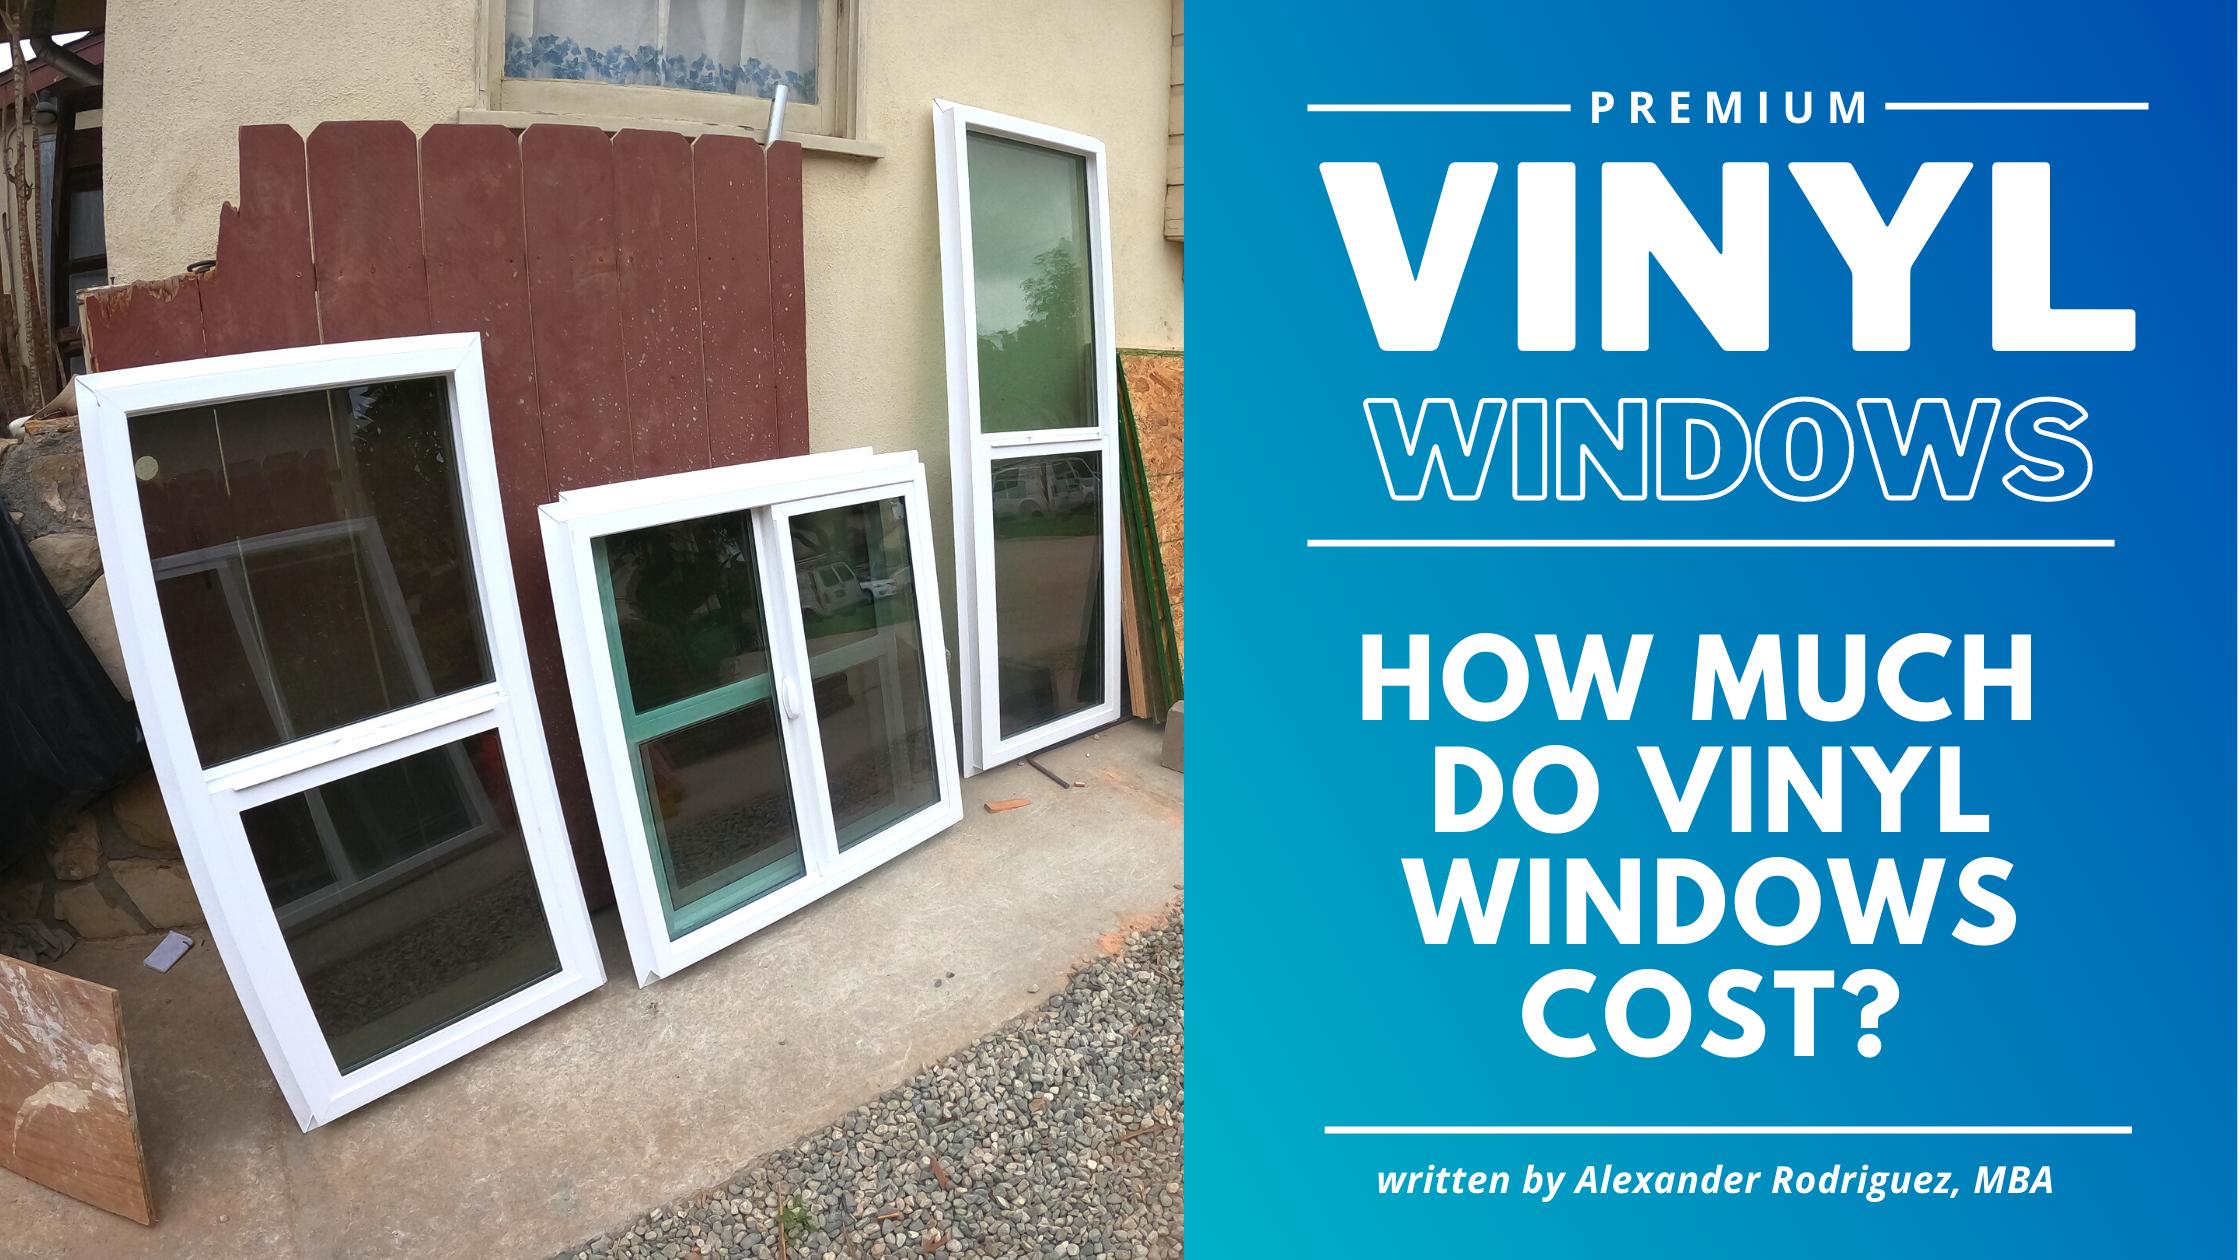 How Much do Vinyl Windows Cost?